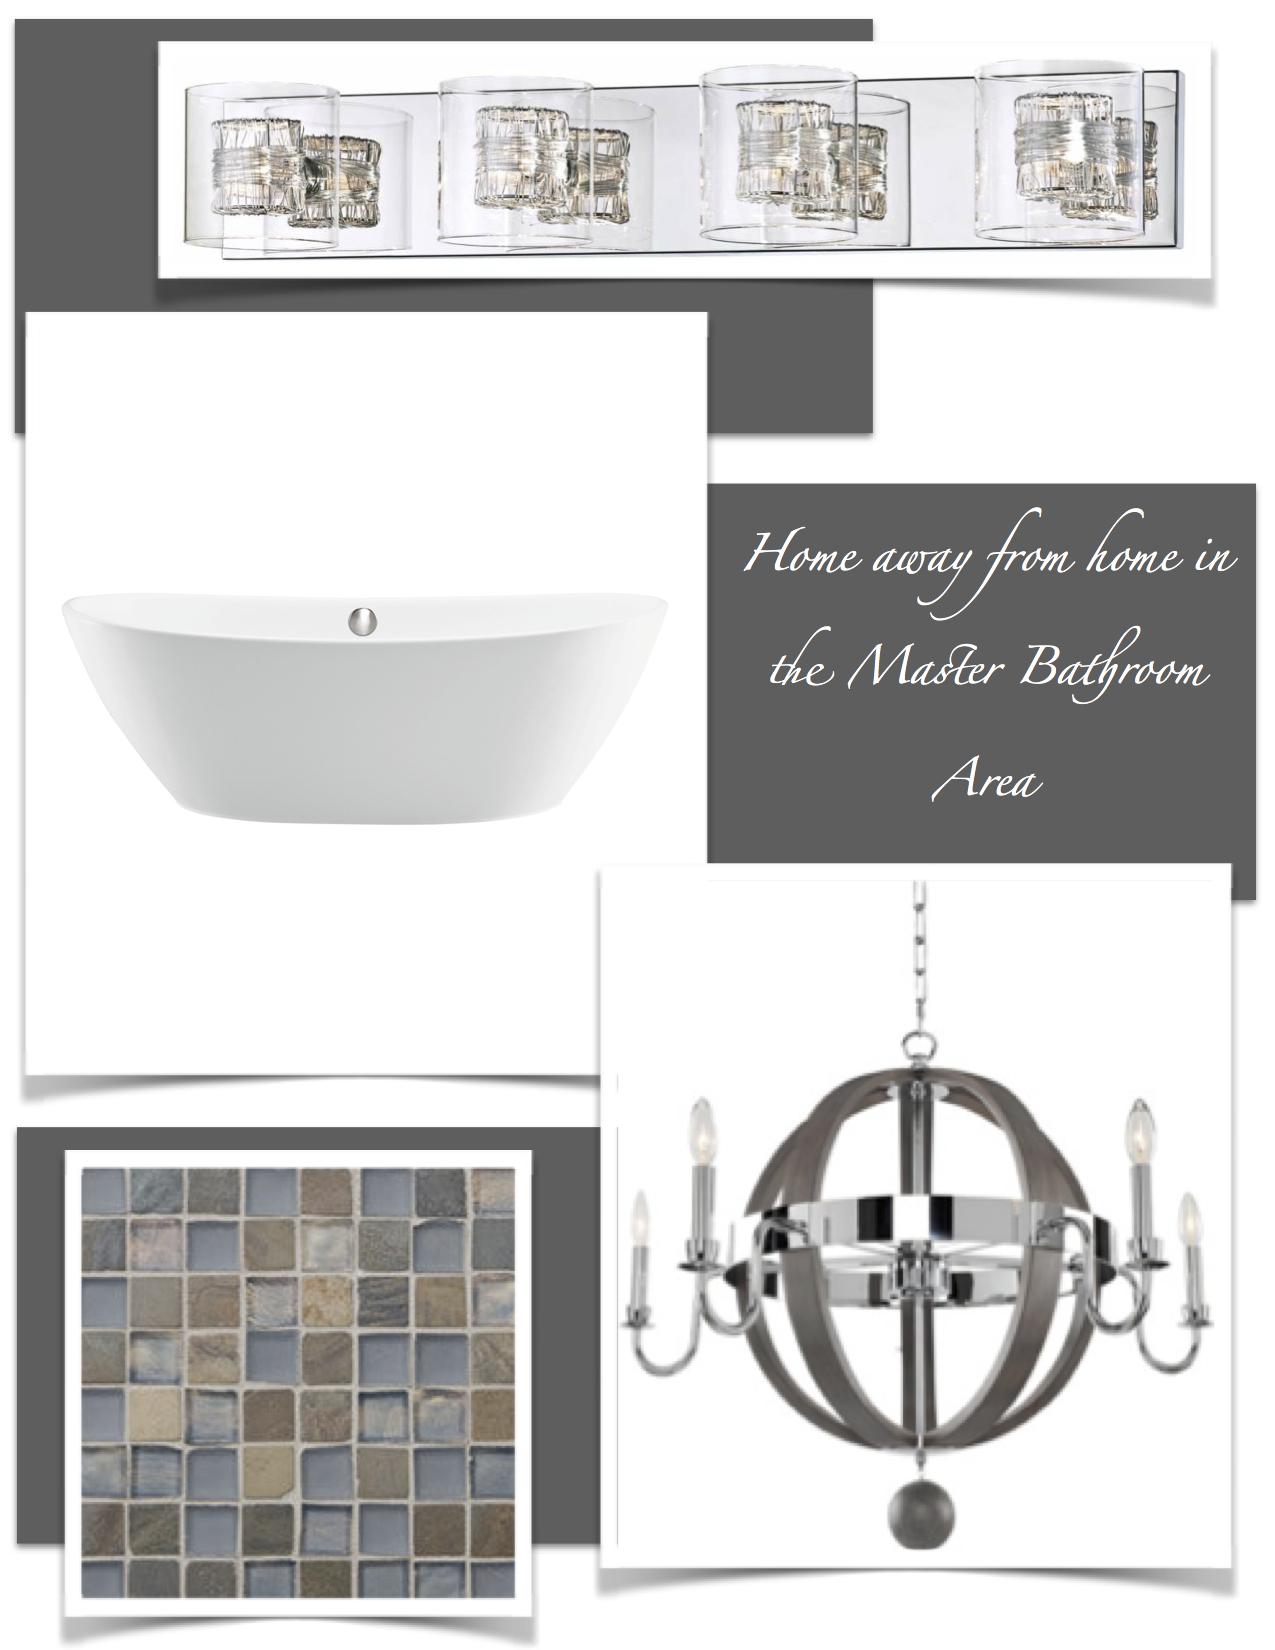 Jeffrey Design Blog - Santa Barbara New Construction 3